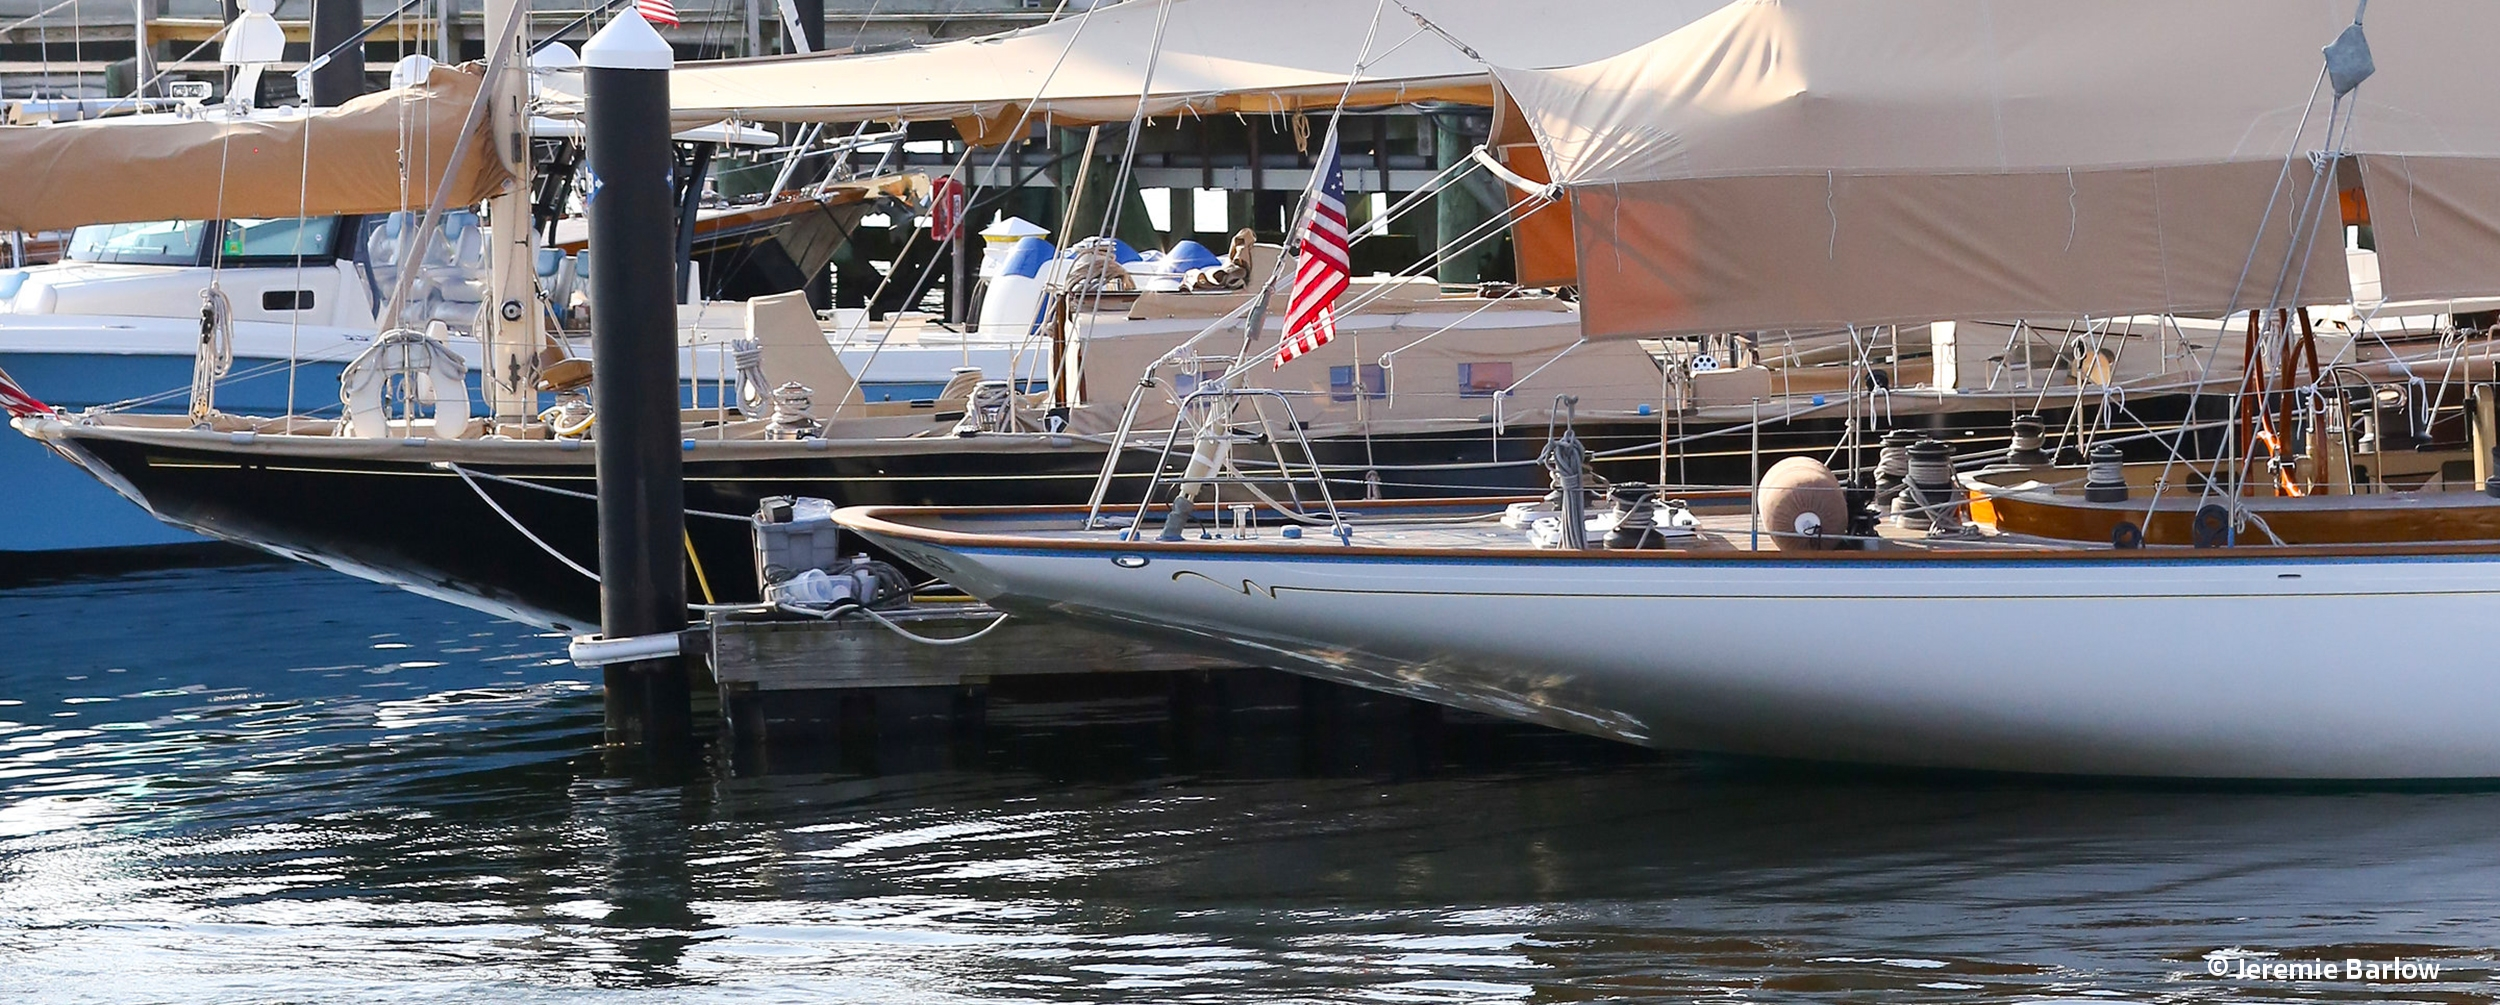 Jeremie_Barlow_Yachts.jpg